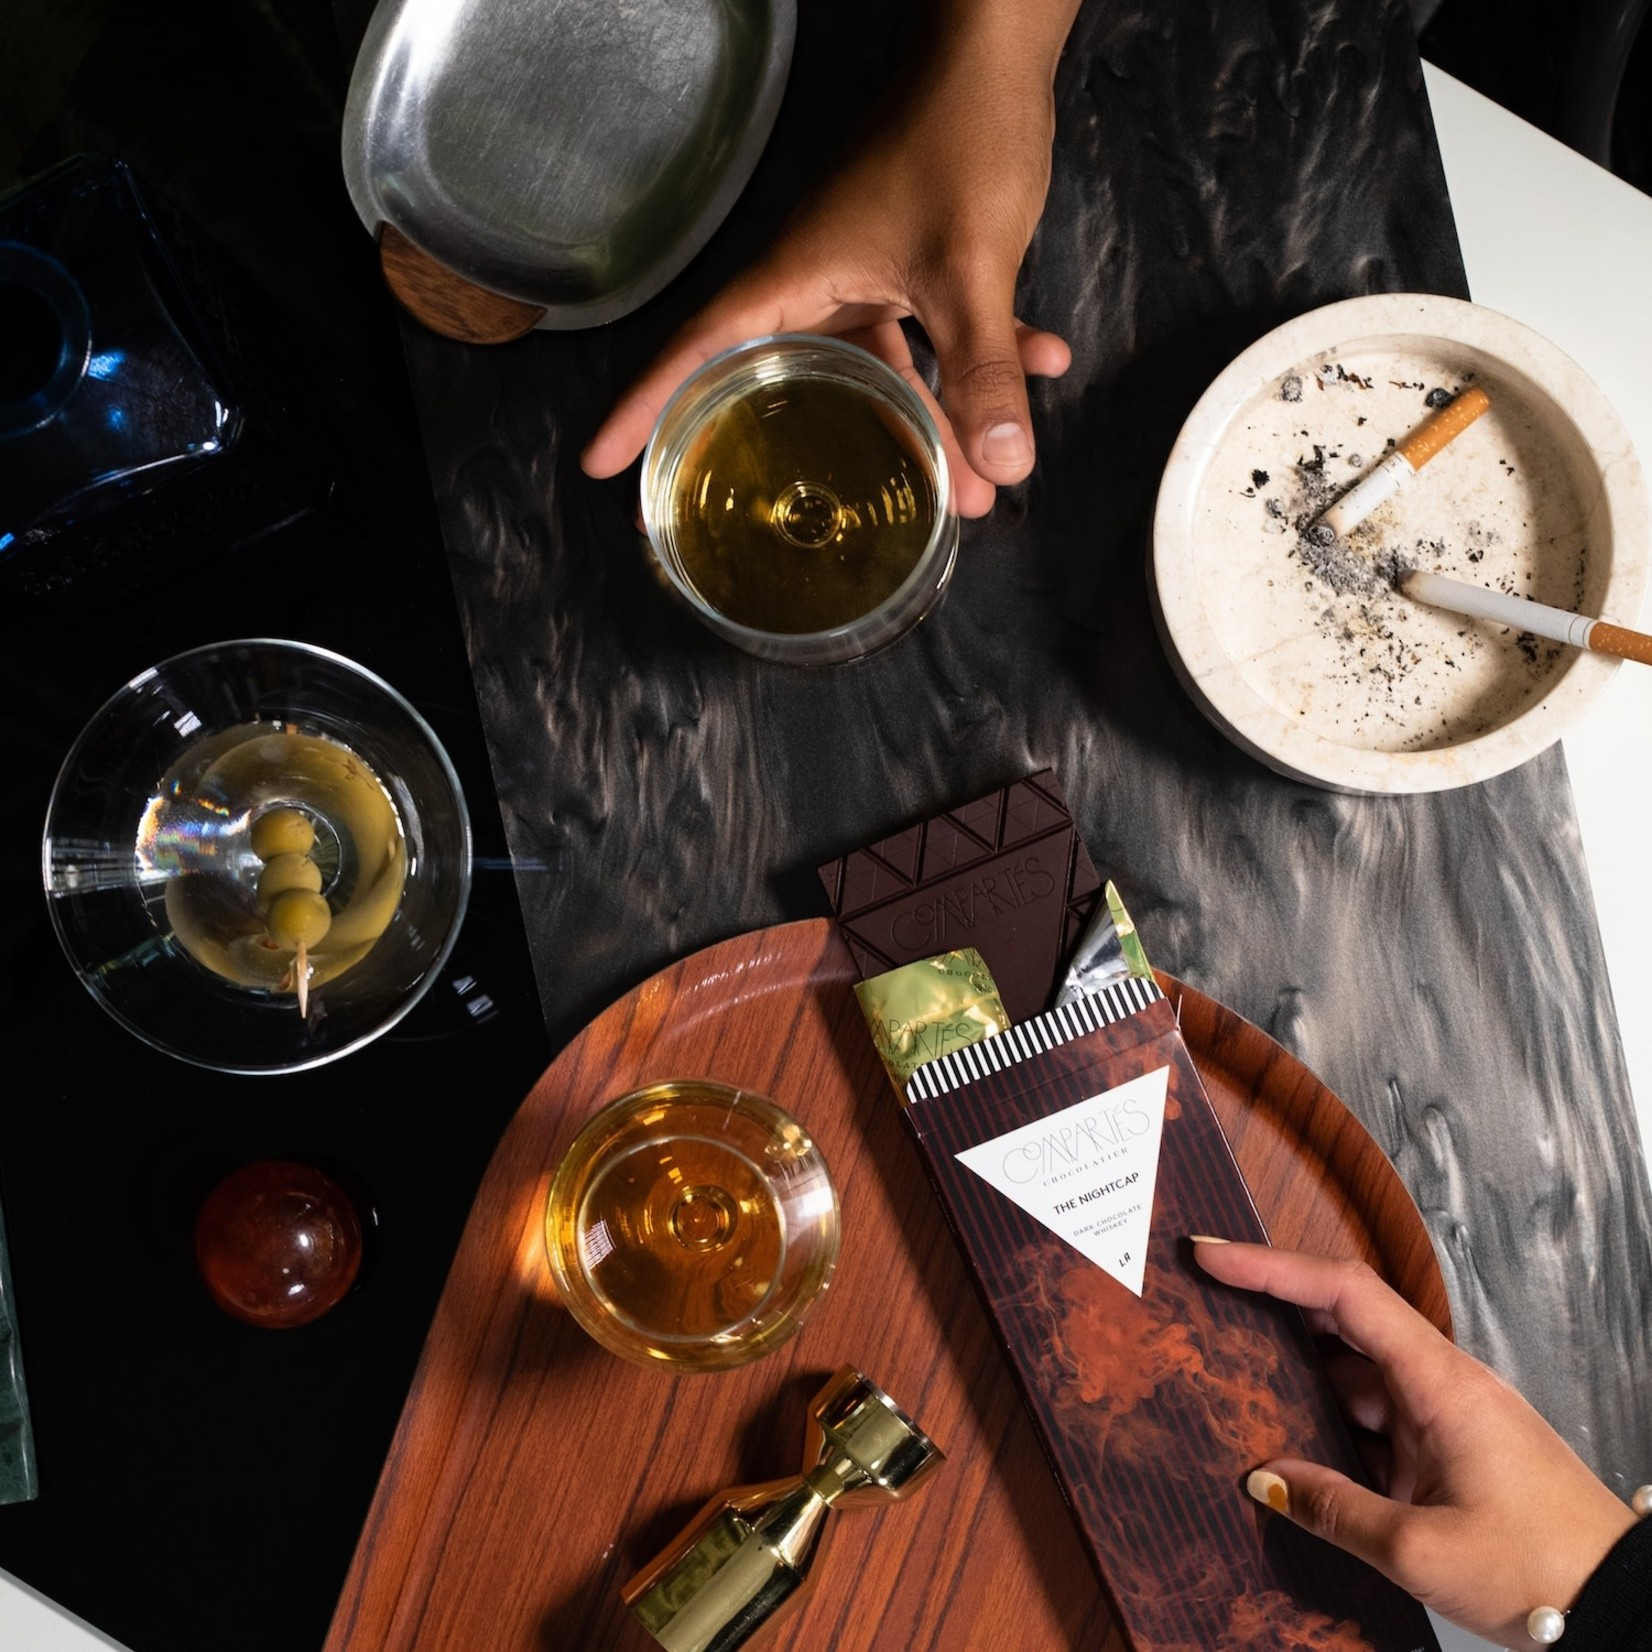 Compartes Chocolate Compartes Chocolate Nightcap Whisky Dark Chocolate Bar